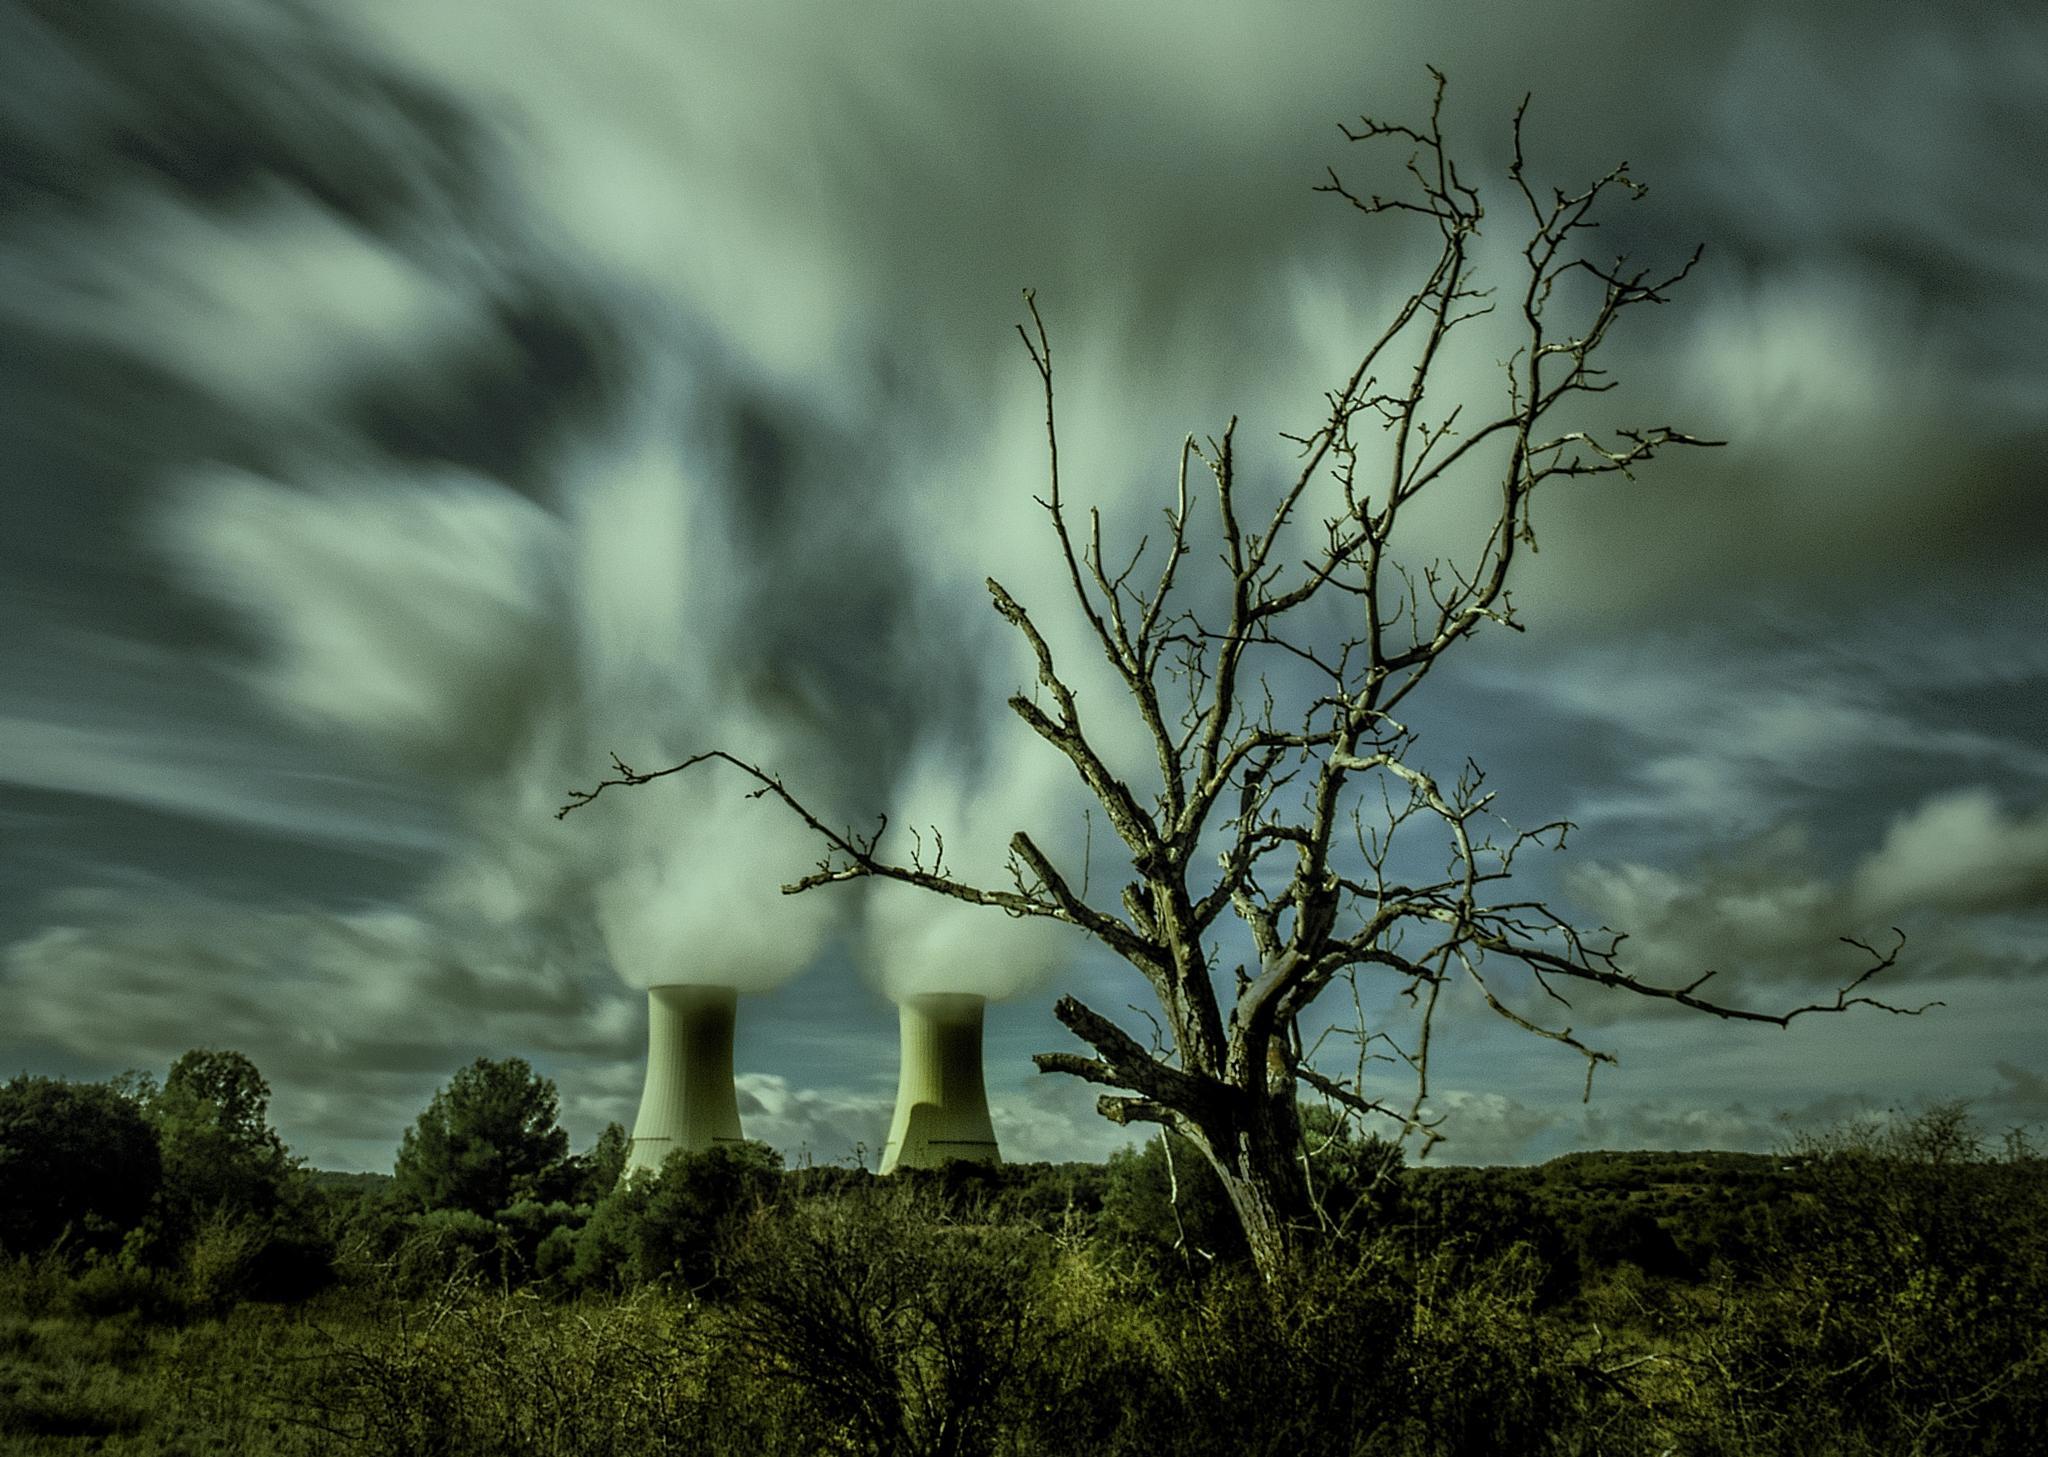 nucleares matan  by miguellopezdeharo